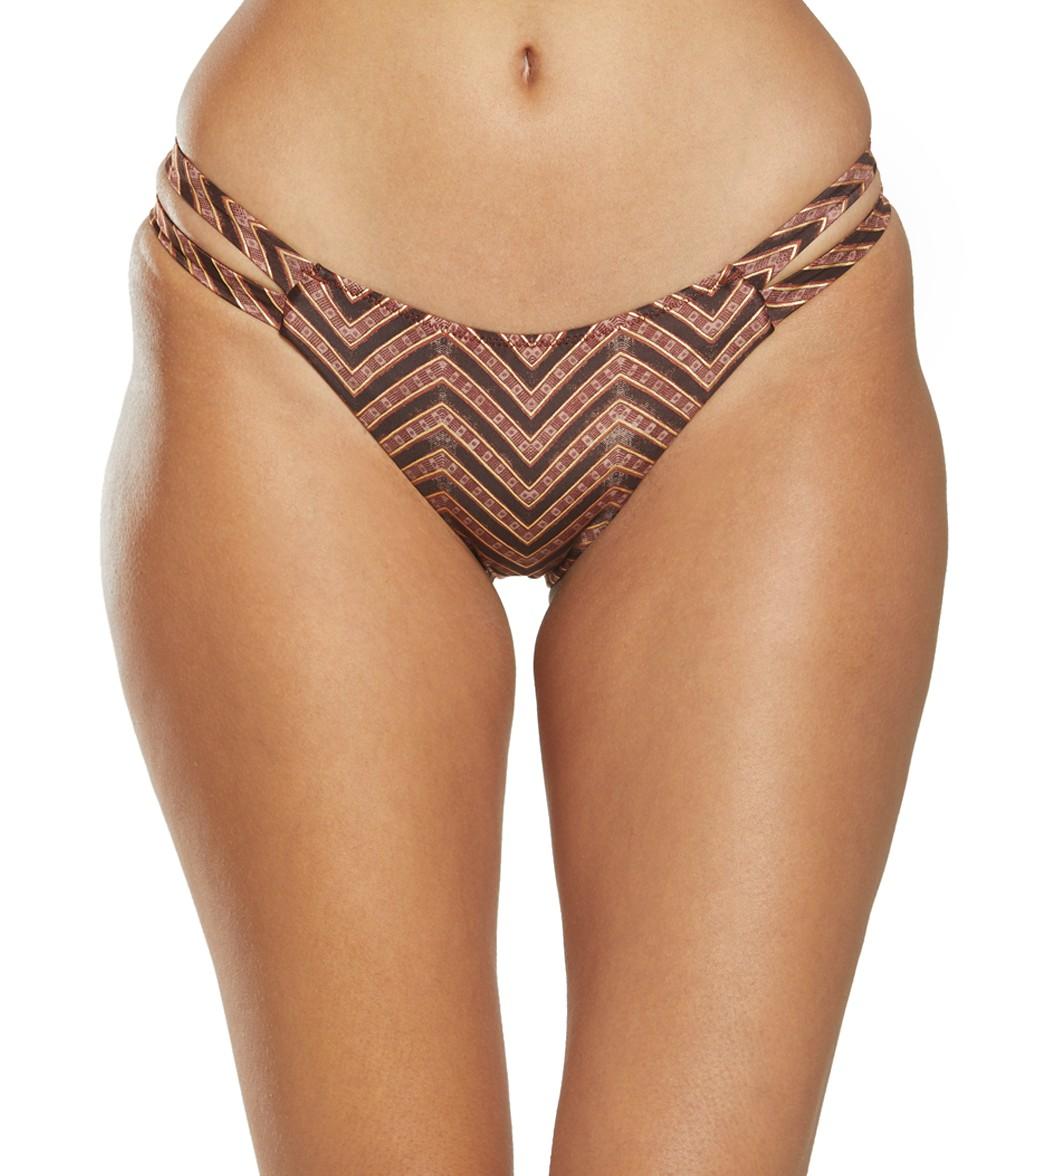 Tigerlily Imane High Tiger Bikini Bottom - Zig Zag